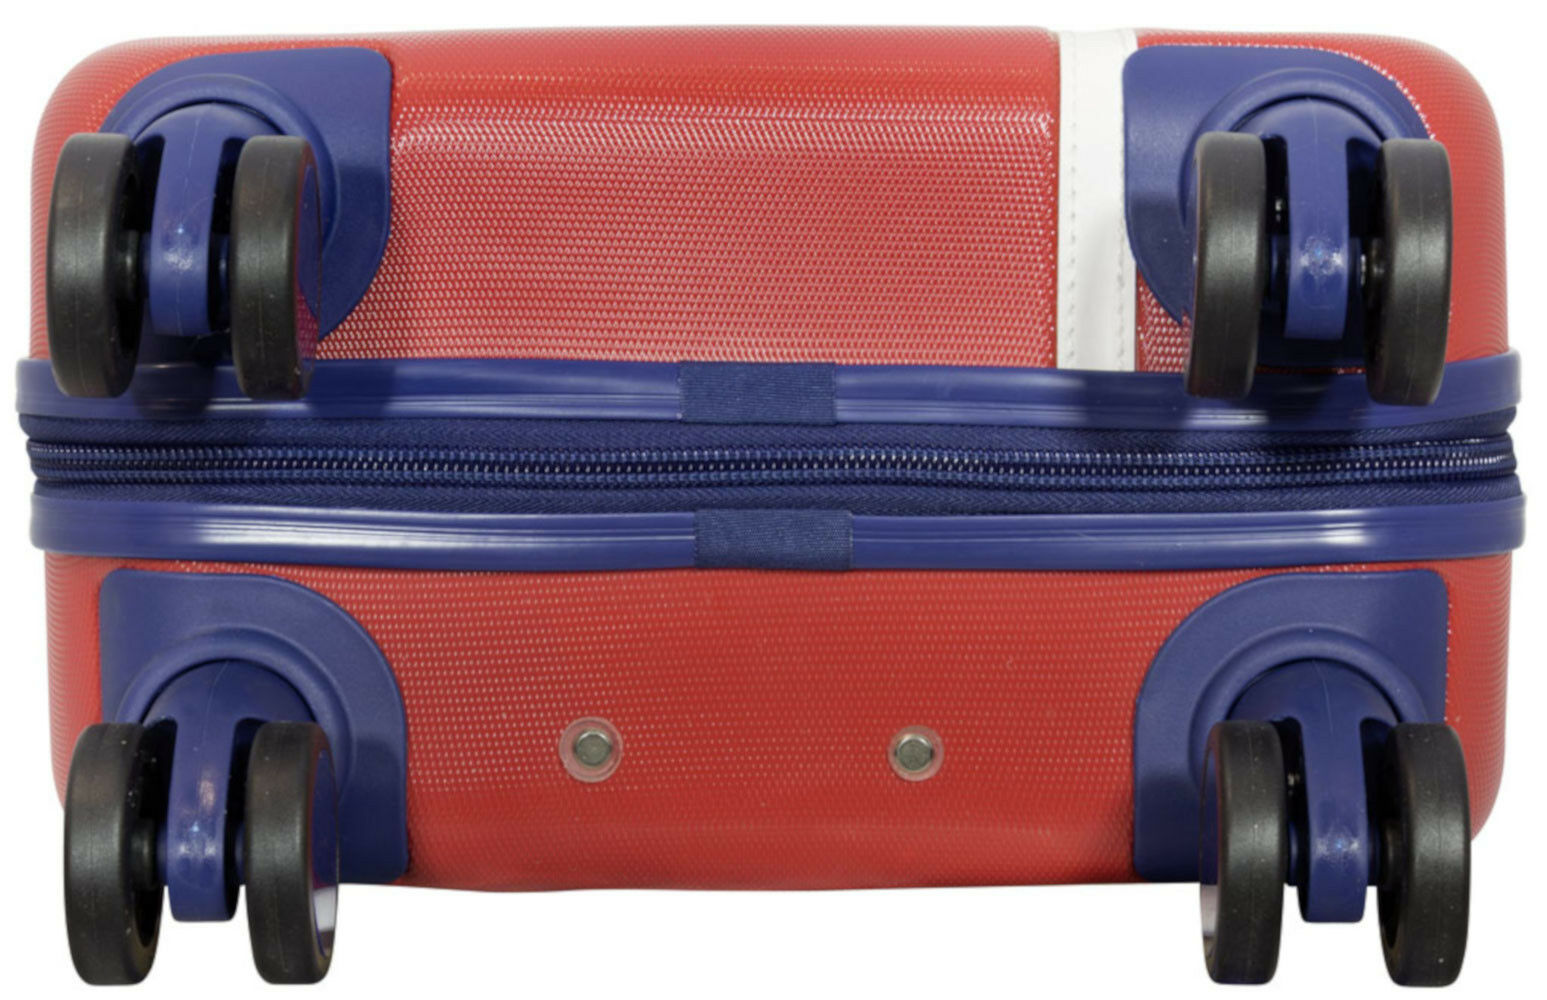 ABS Coquille Dure Valise de voyage trolley montagnes dehnfalte série montagnes trolley rouge taille XL b6abaa